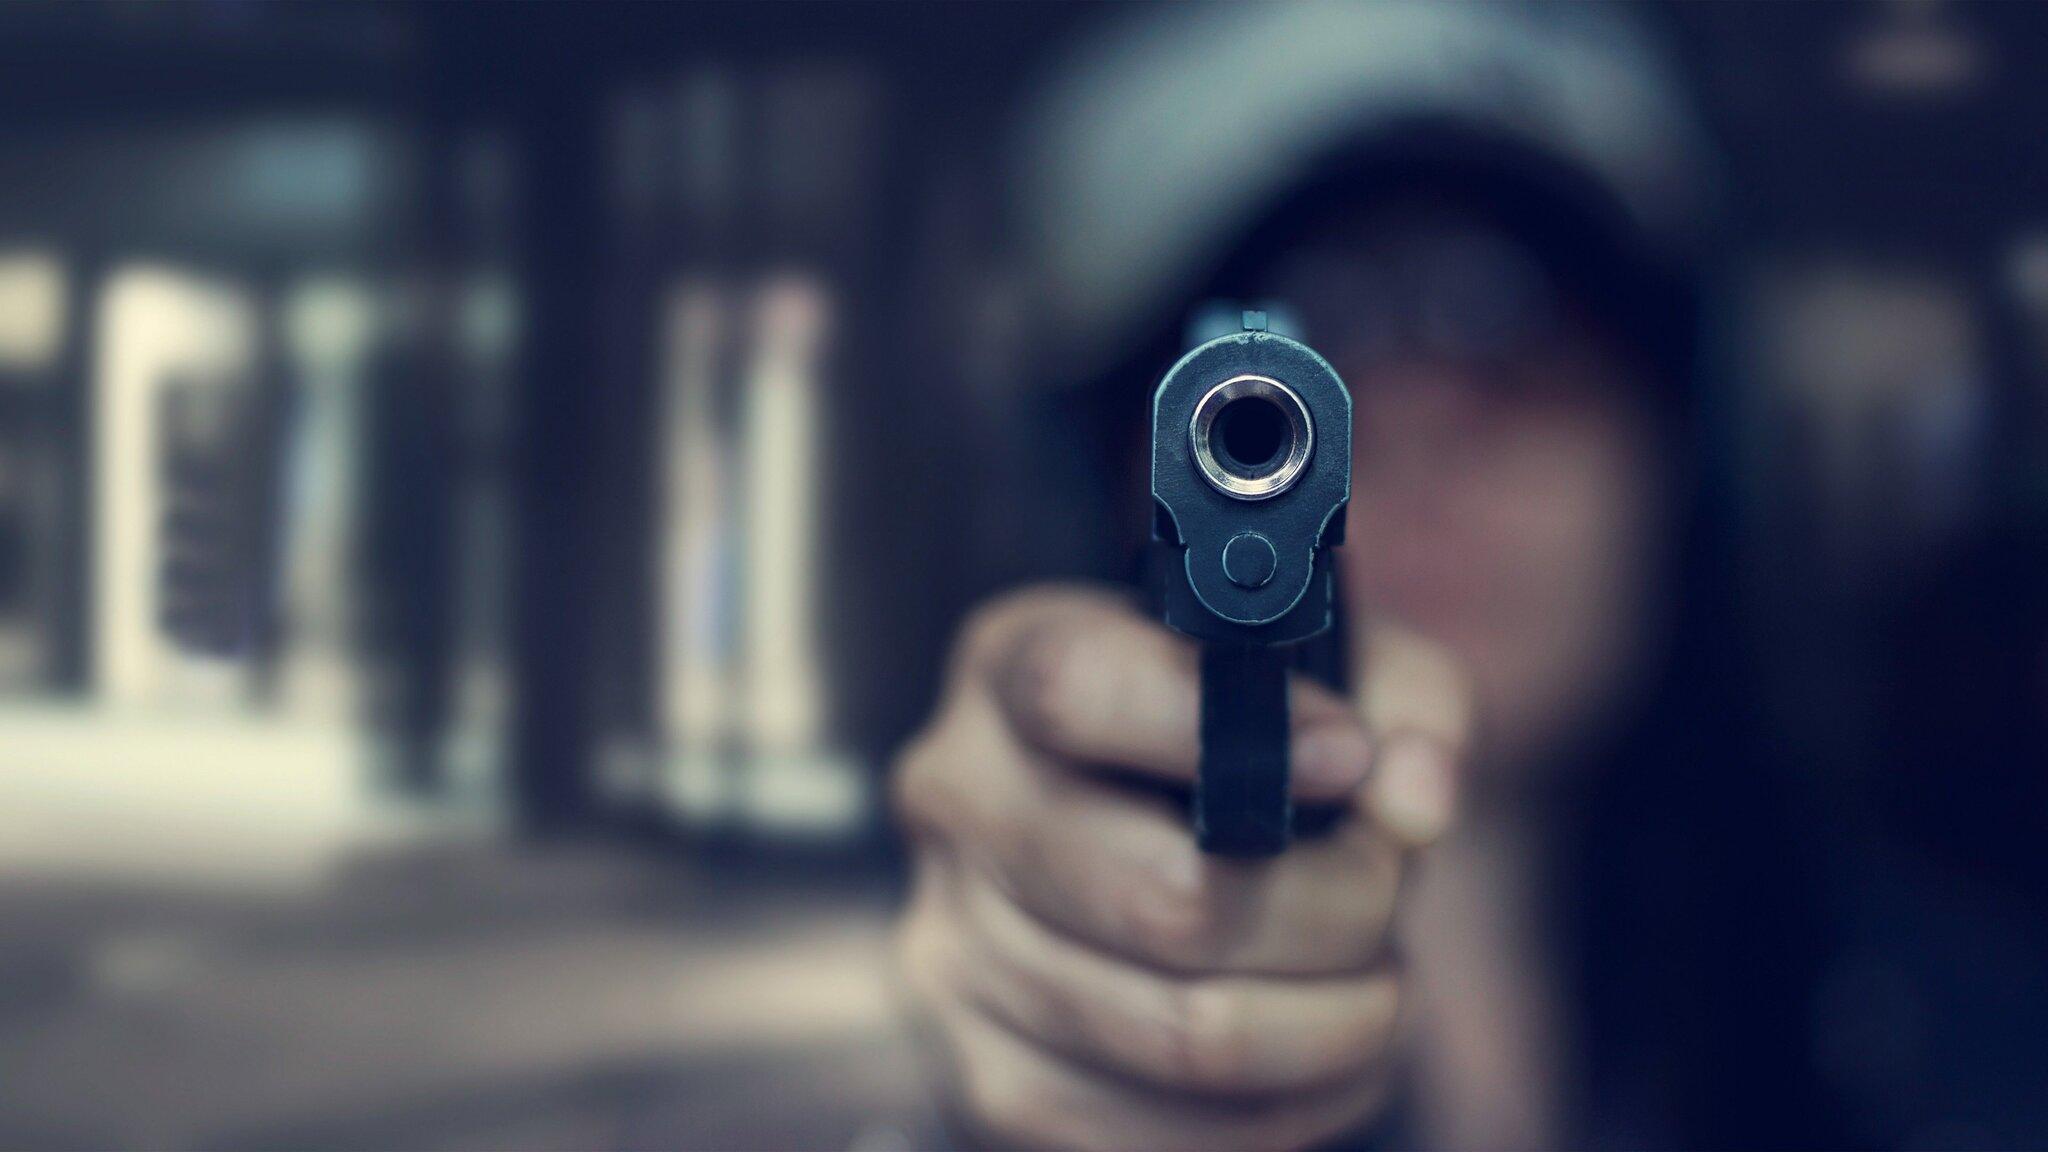 Fallet O.J. Simpson: American crime story